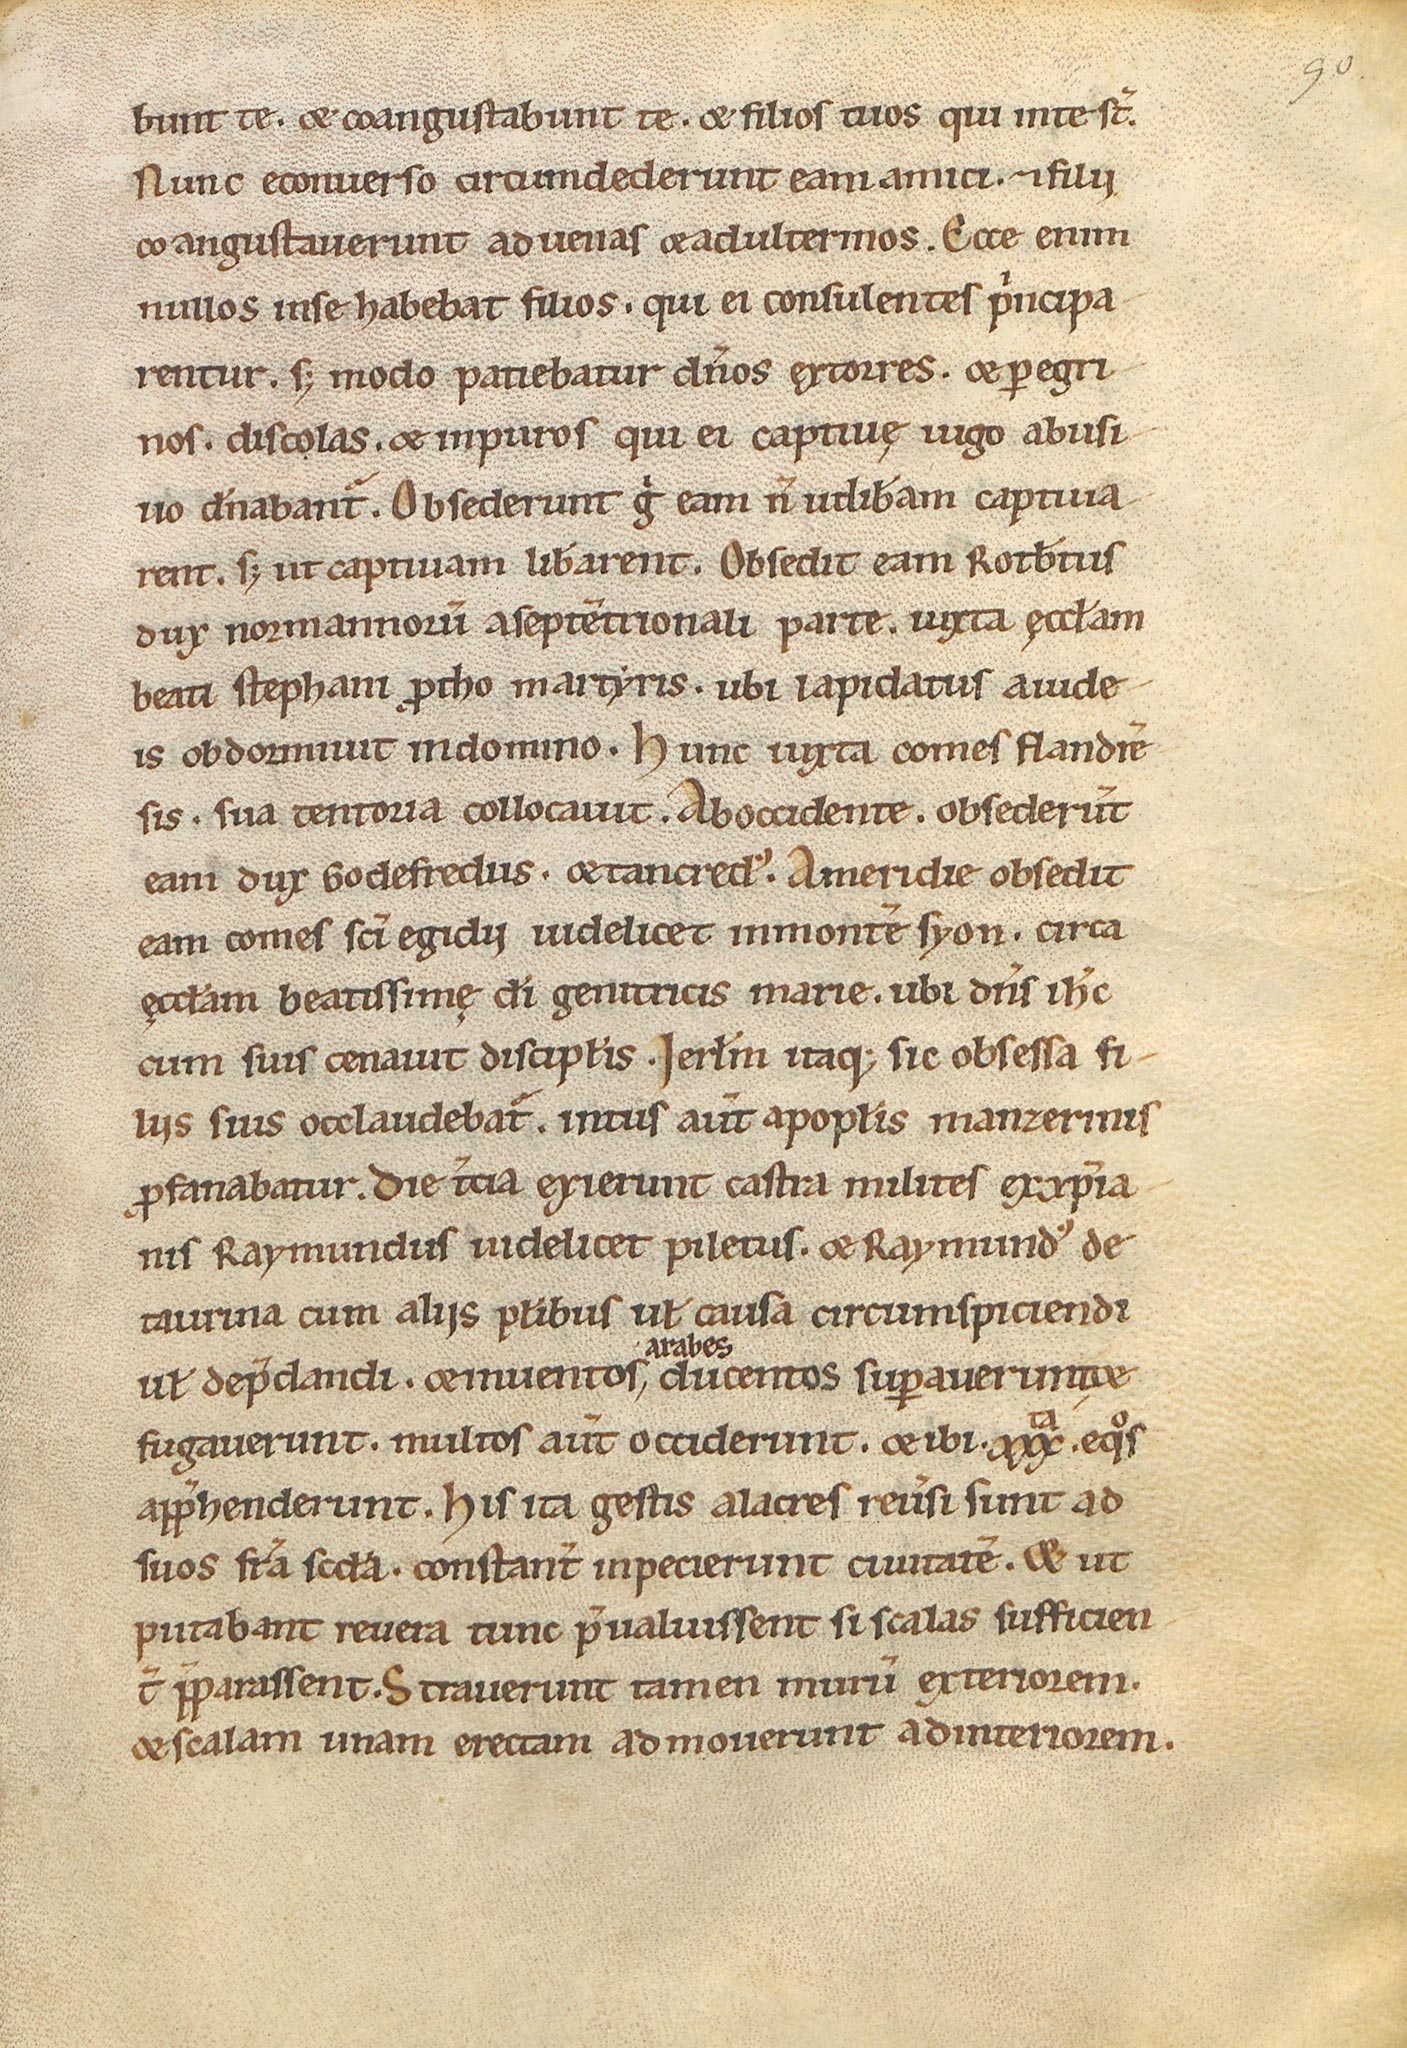 Manuscrit-Historia-Hierosolimitana-90r°